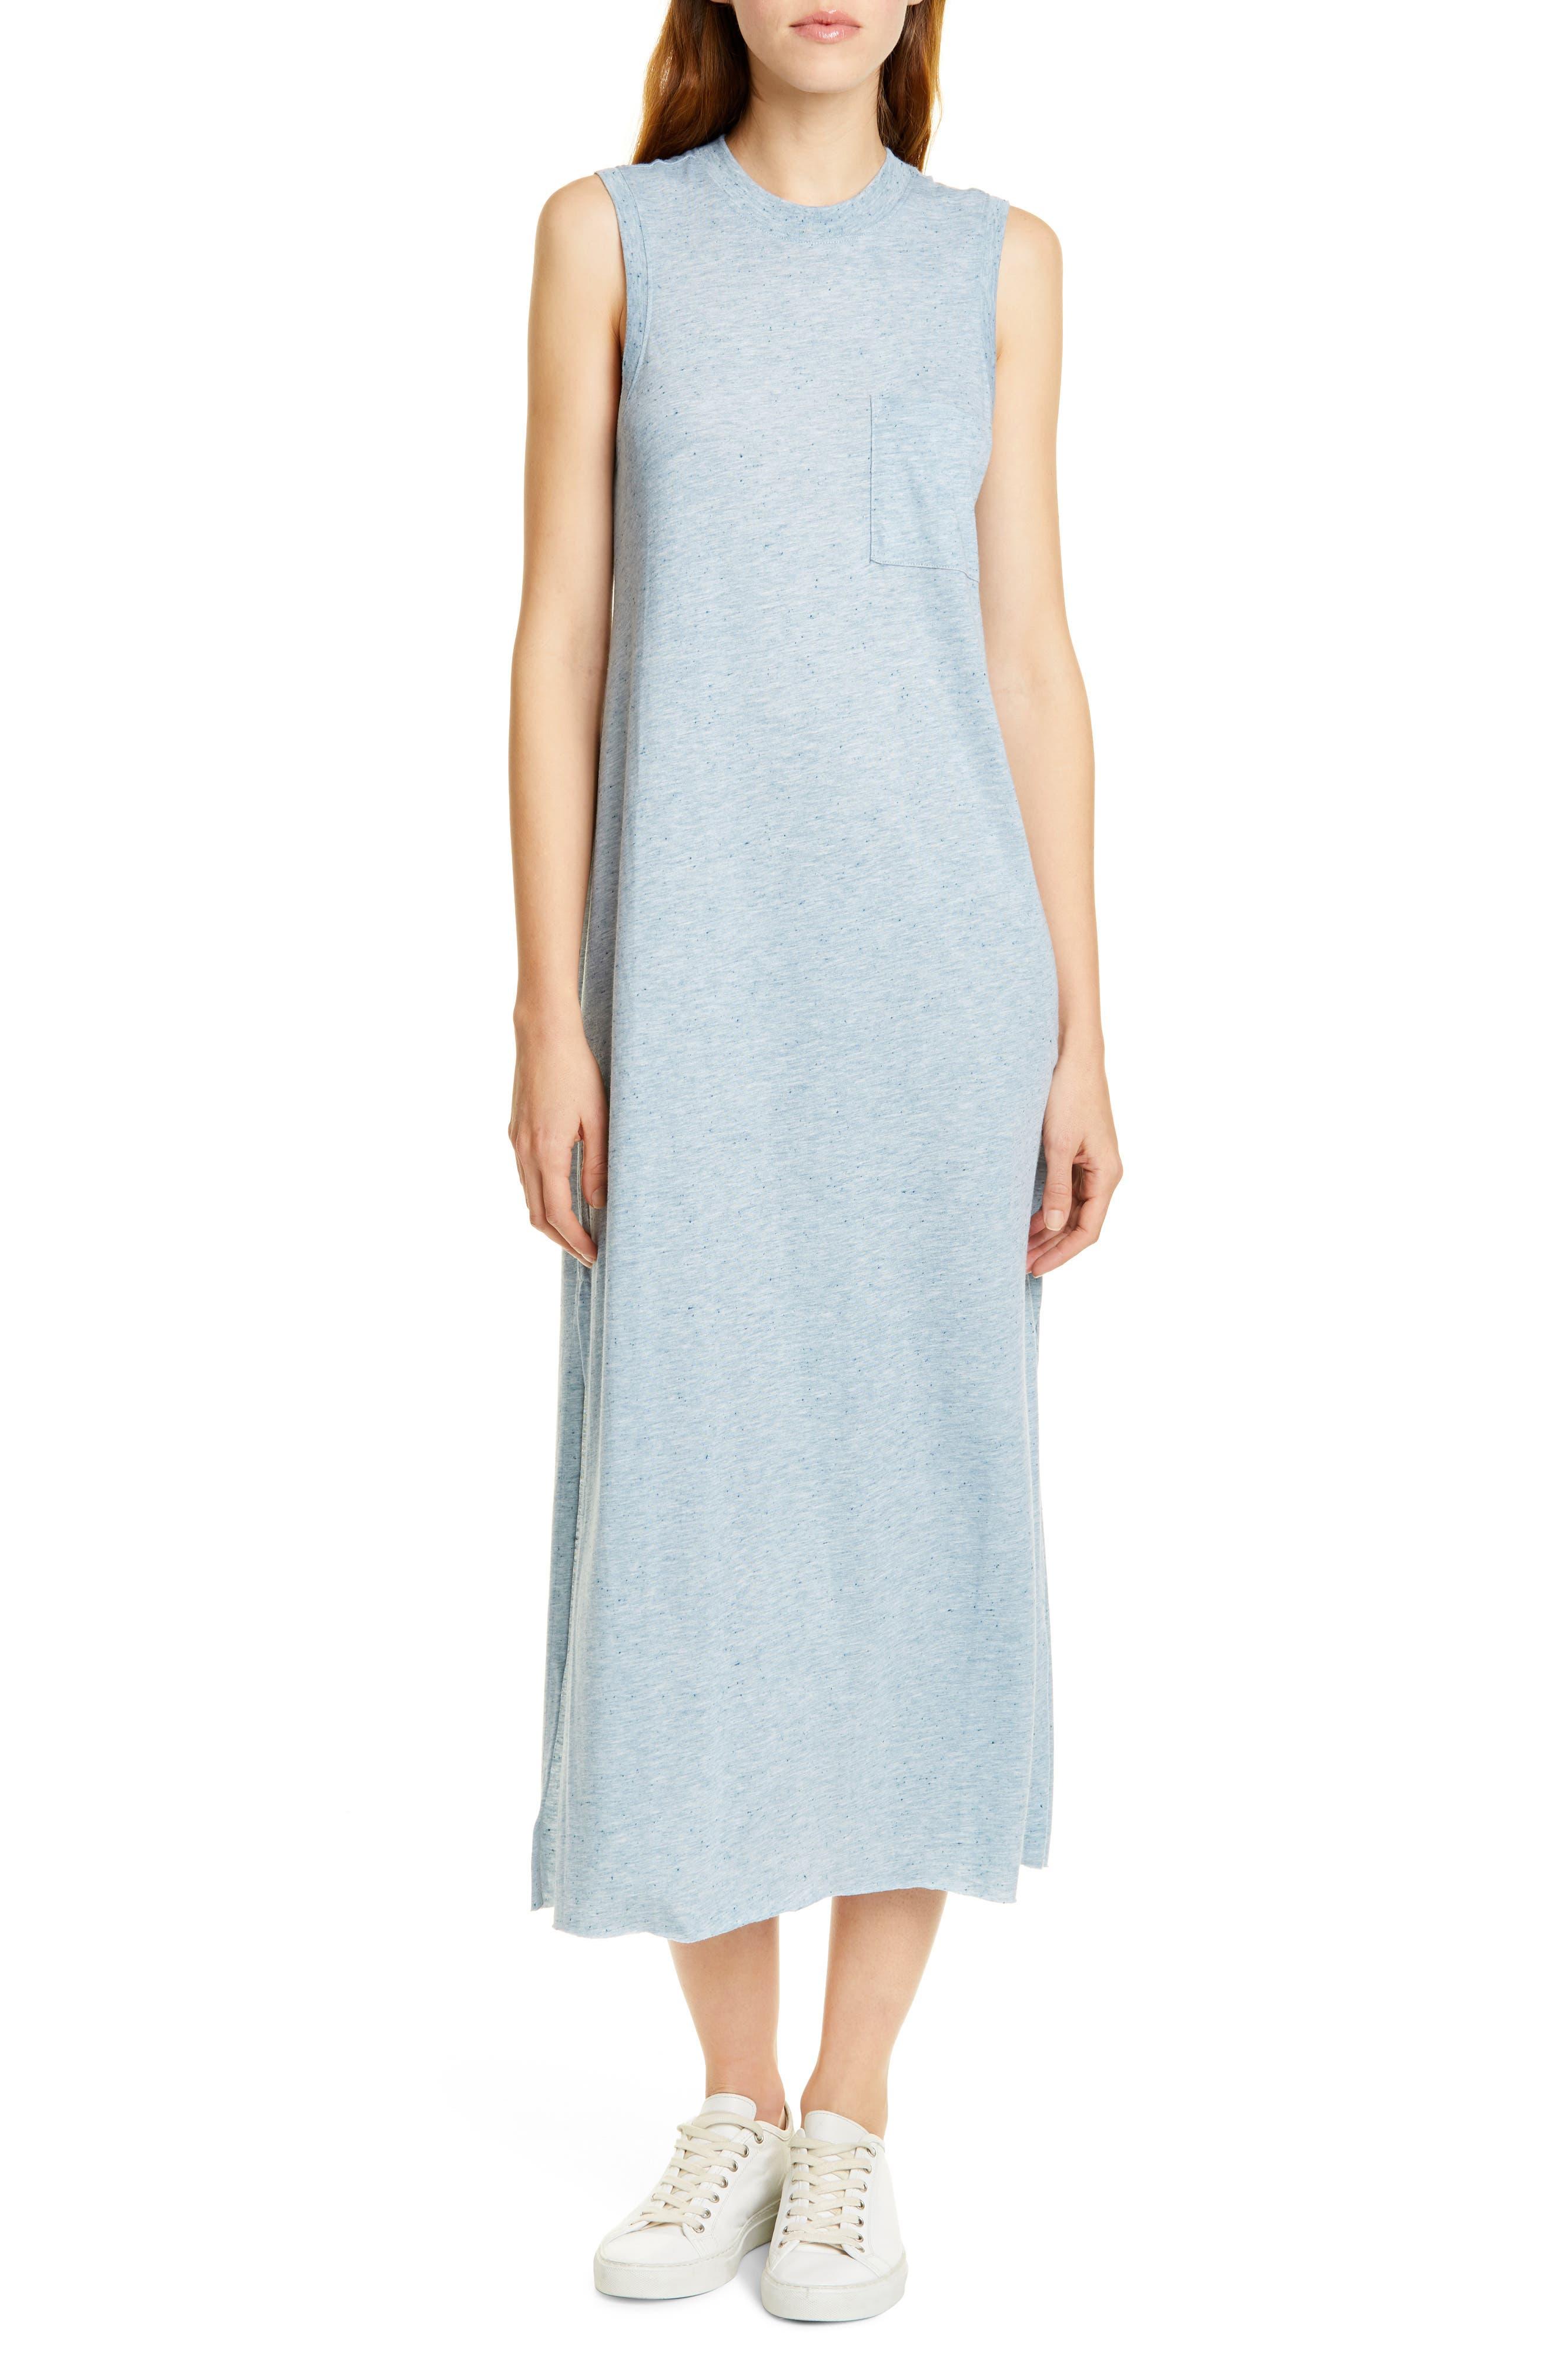 Atm Anthony Thomas Melillo Donegal Pocket Midi Dress